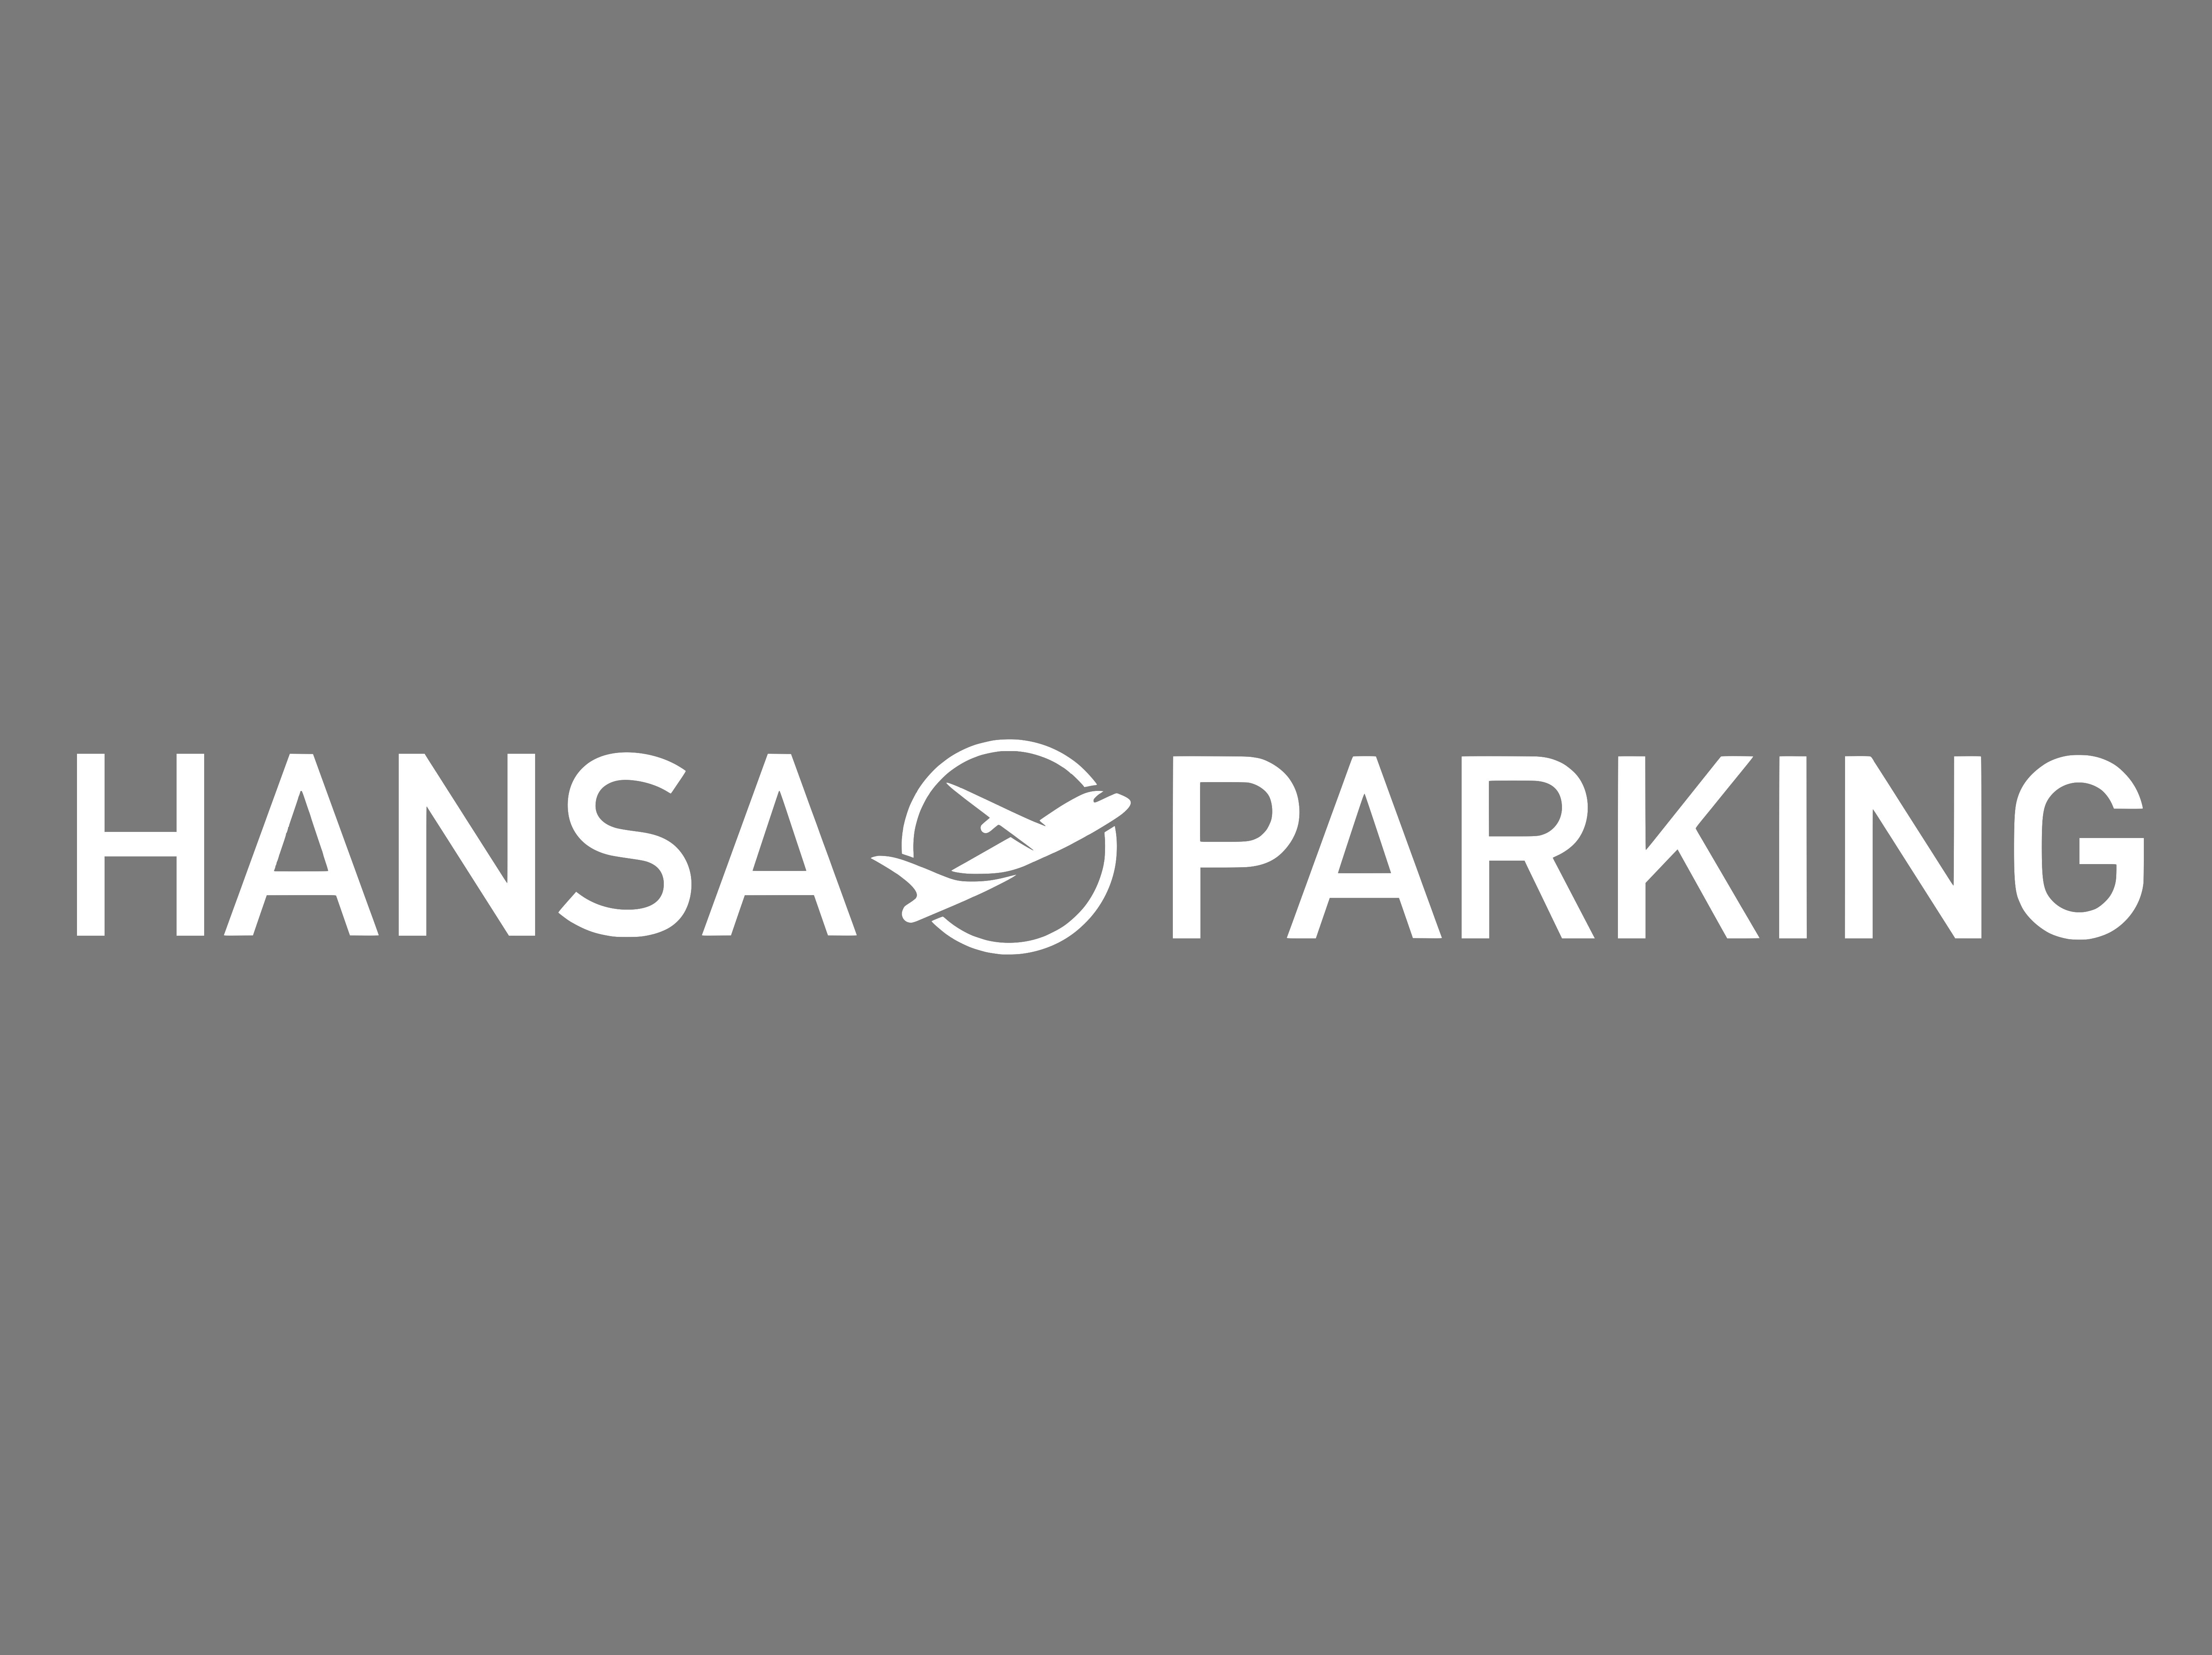 Hansa Parking